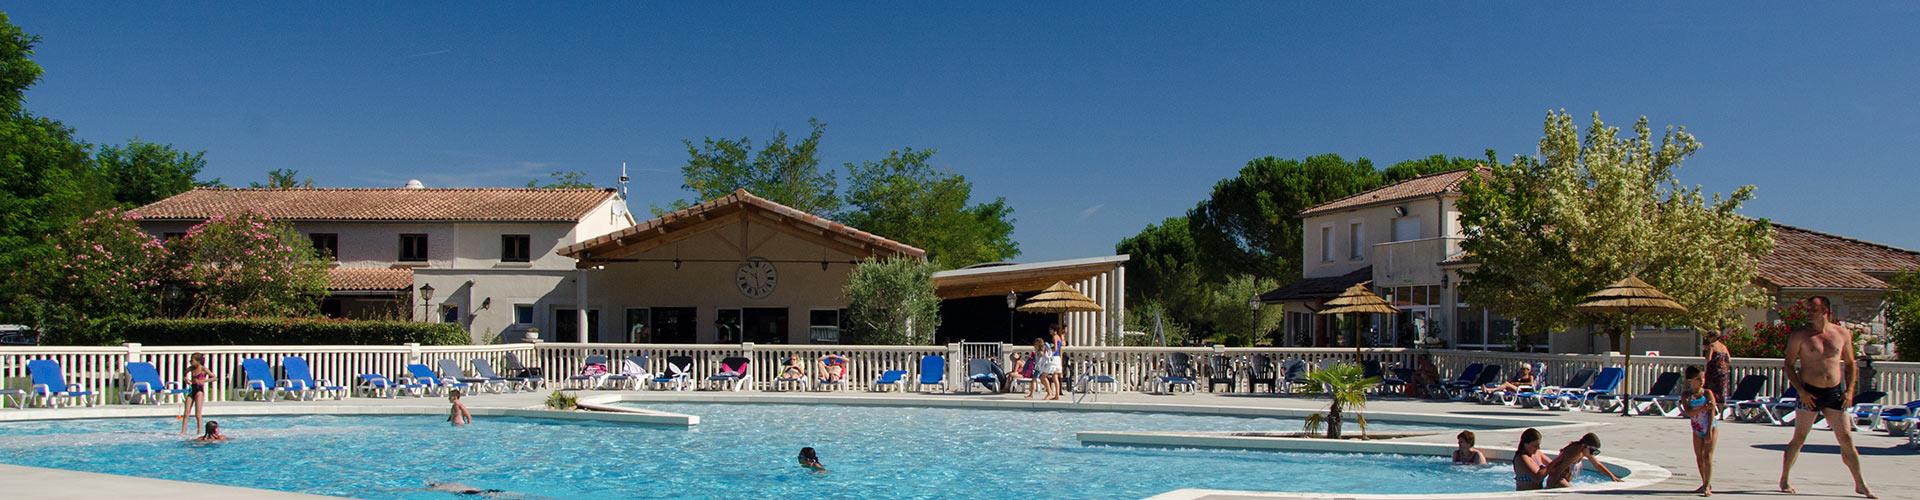 Campsite ardeche la grand 39 terre with vagues oc anes for Camping ardeche ruoms avec piscine